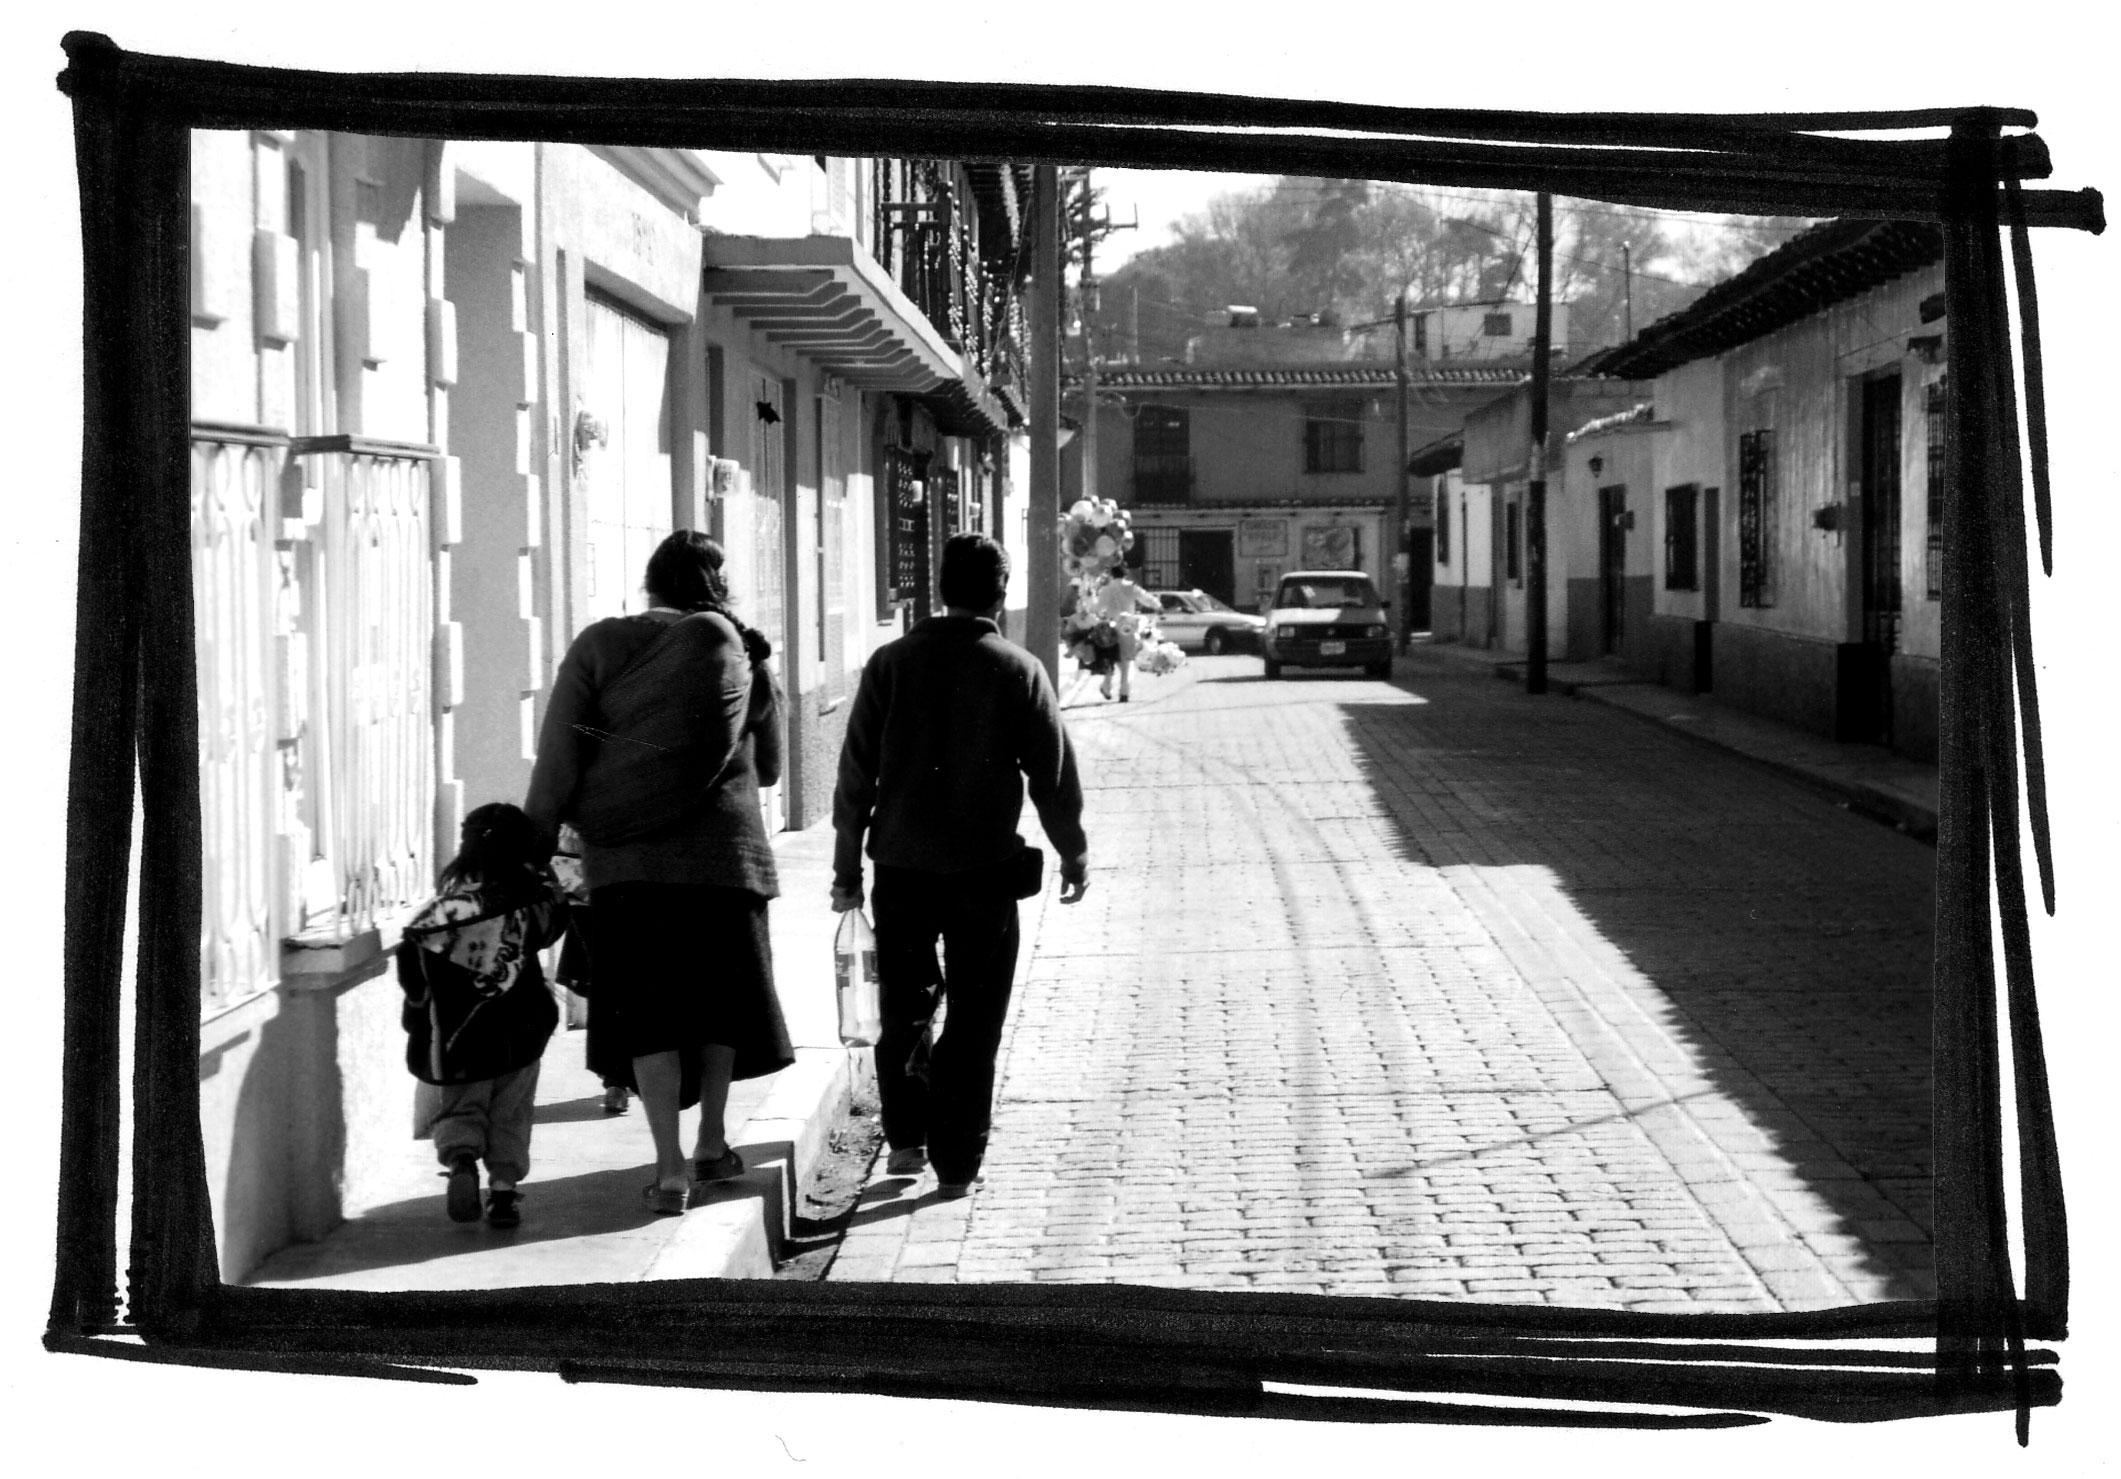 familia-caminando-WEB.jpg